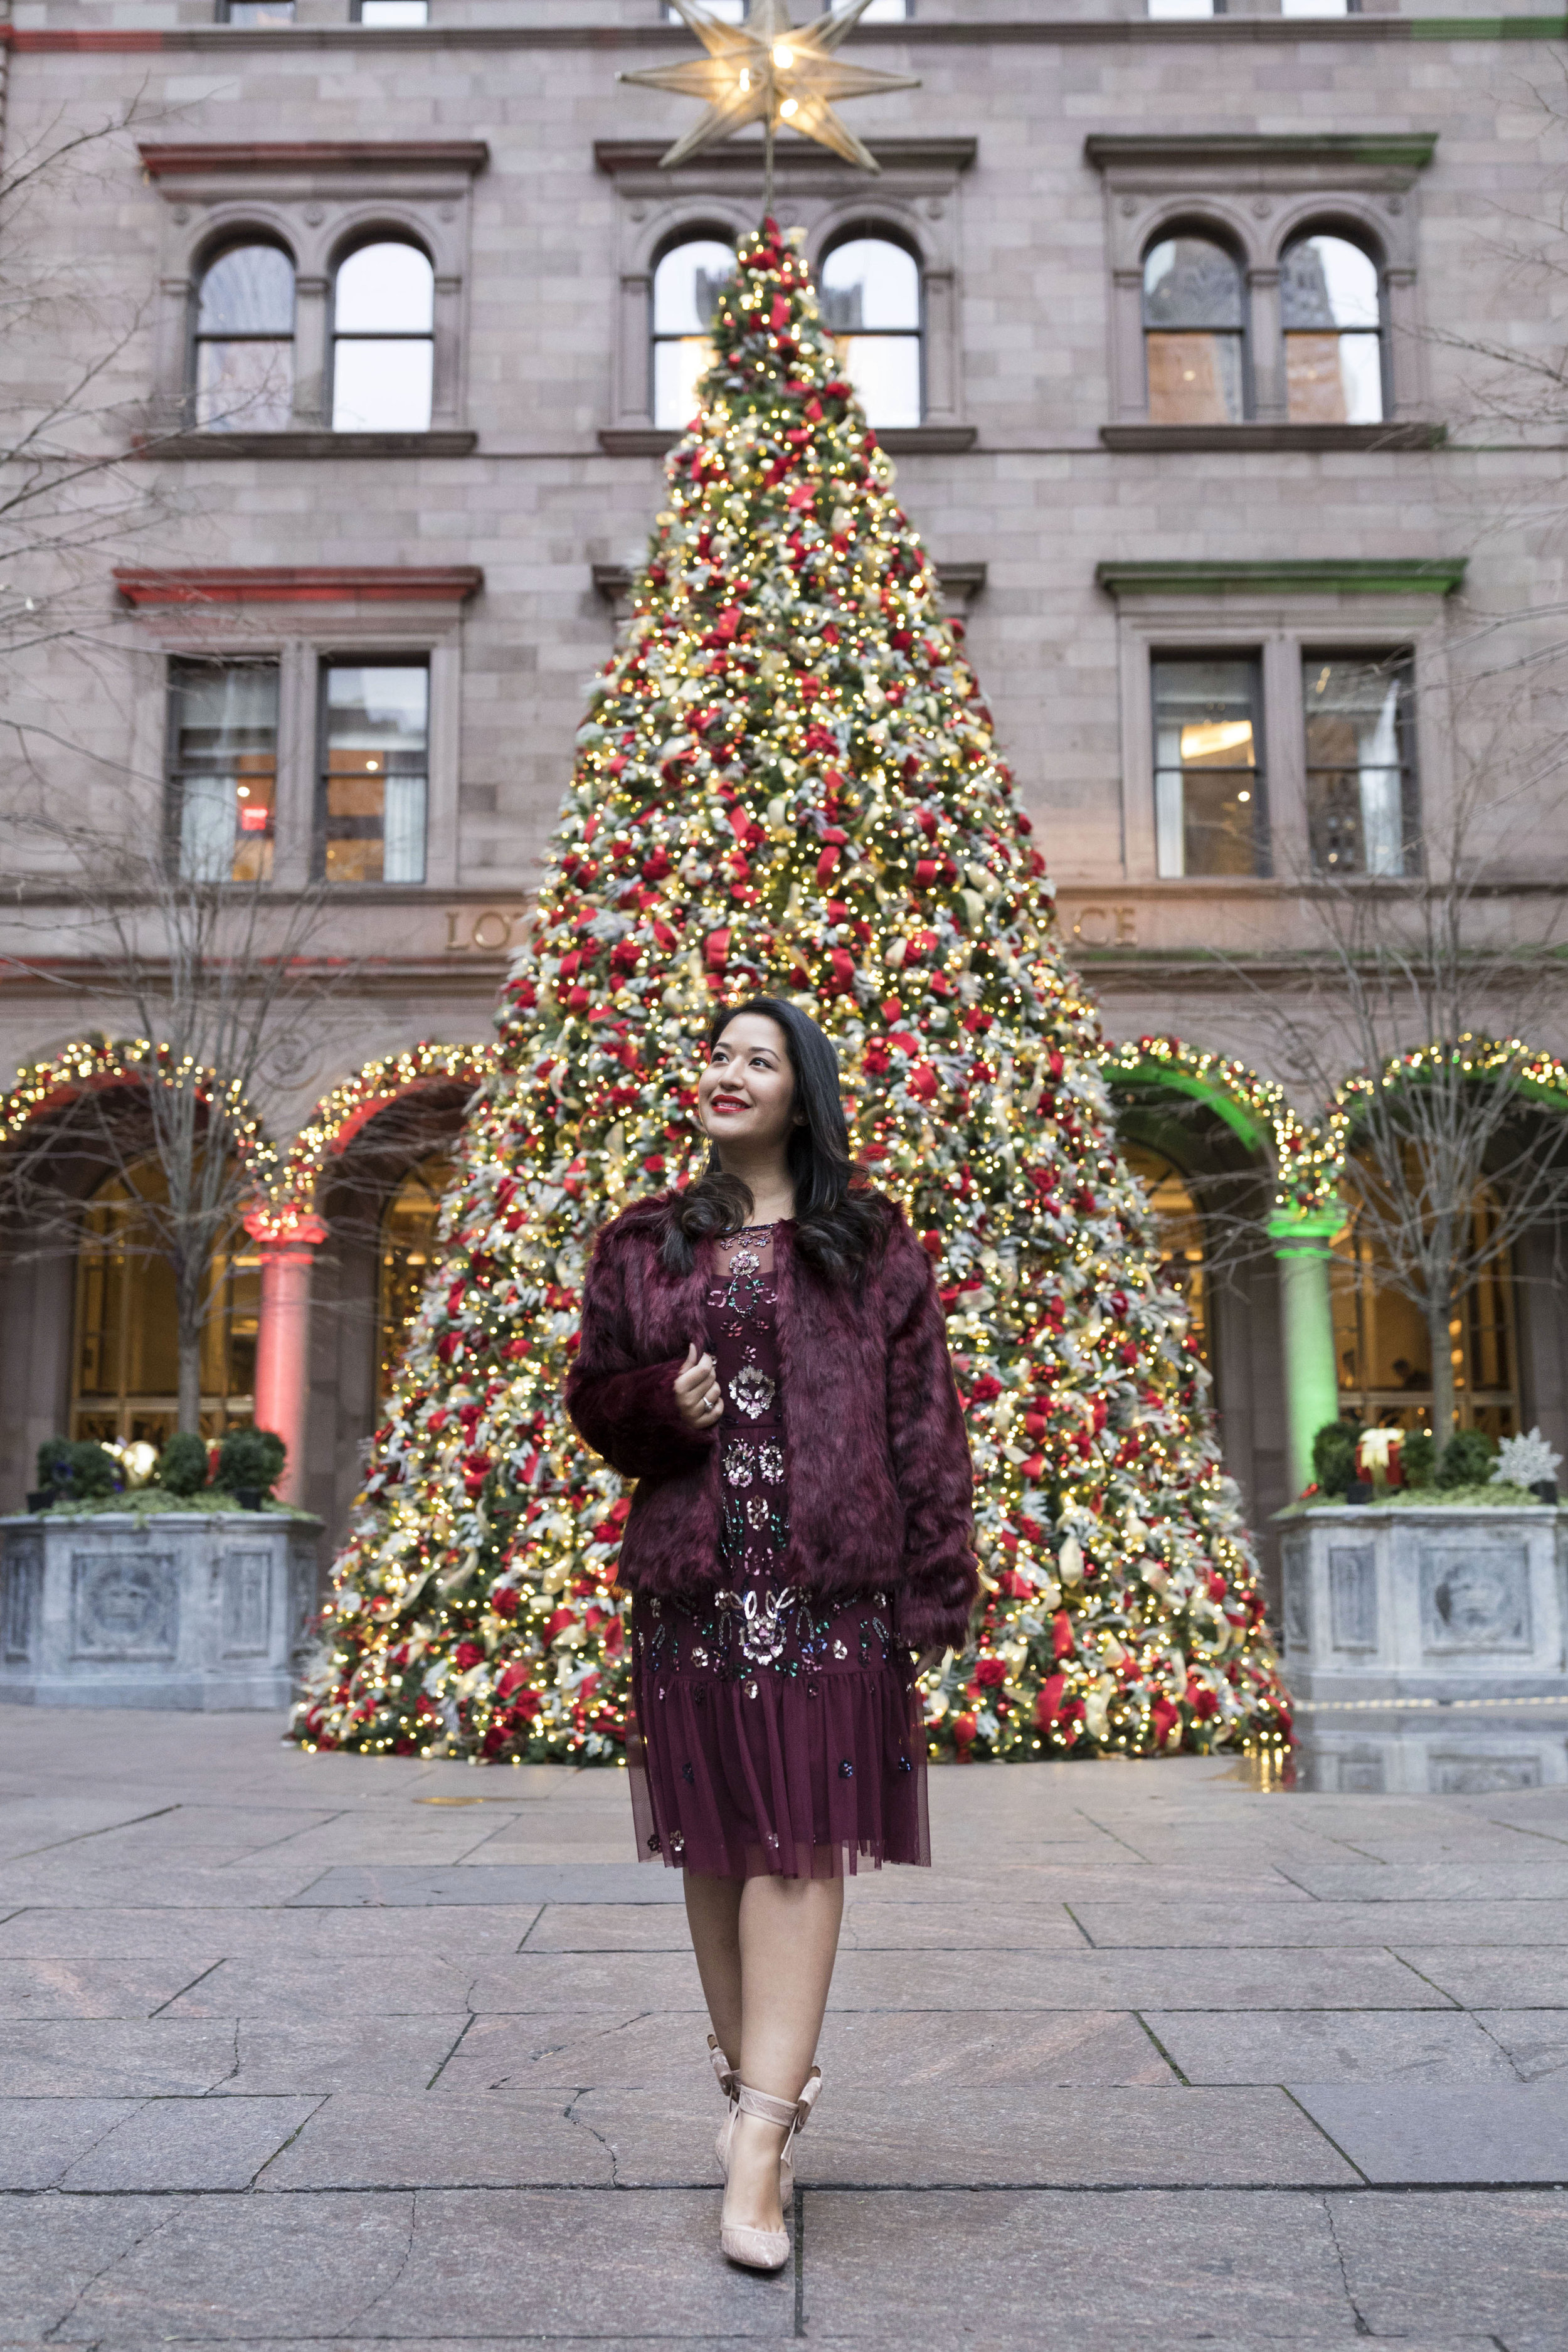 Krity S x Holiday Outfit x Aidan Beaded Burgundy Short Dress4.jpg